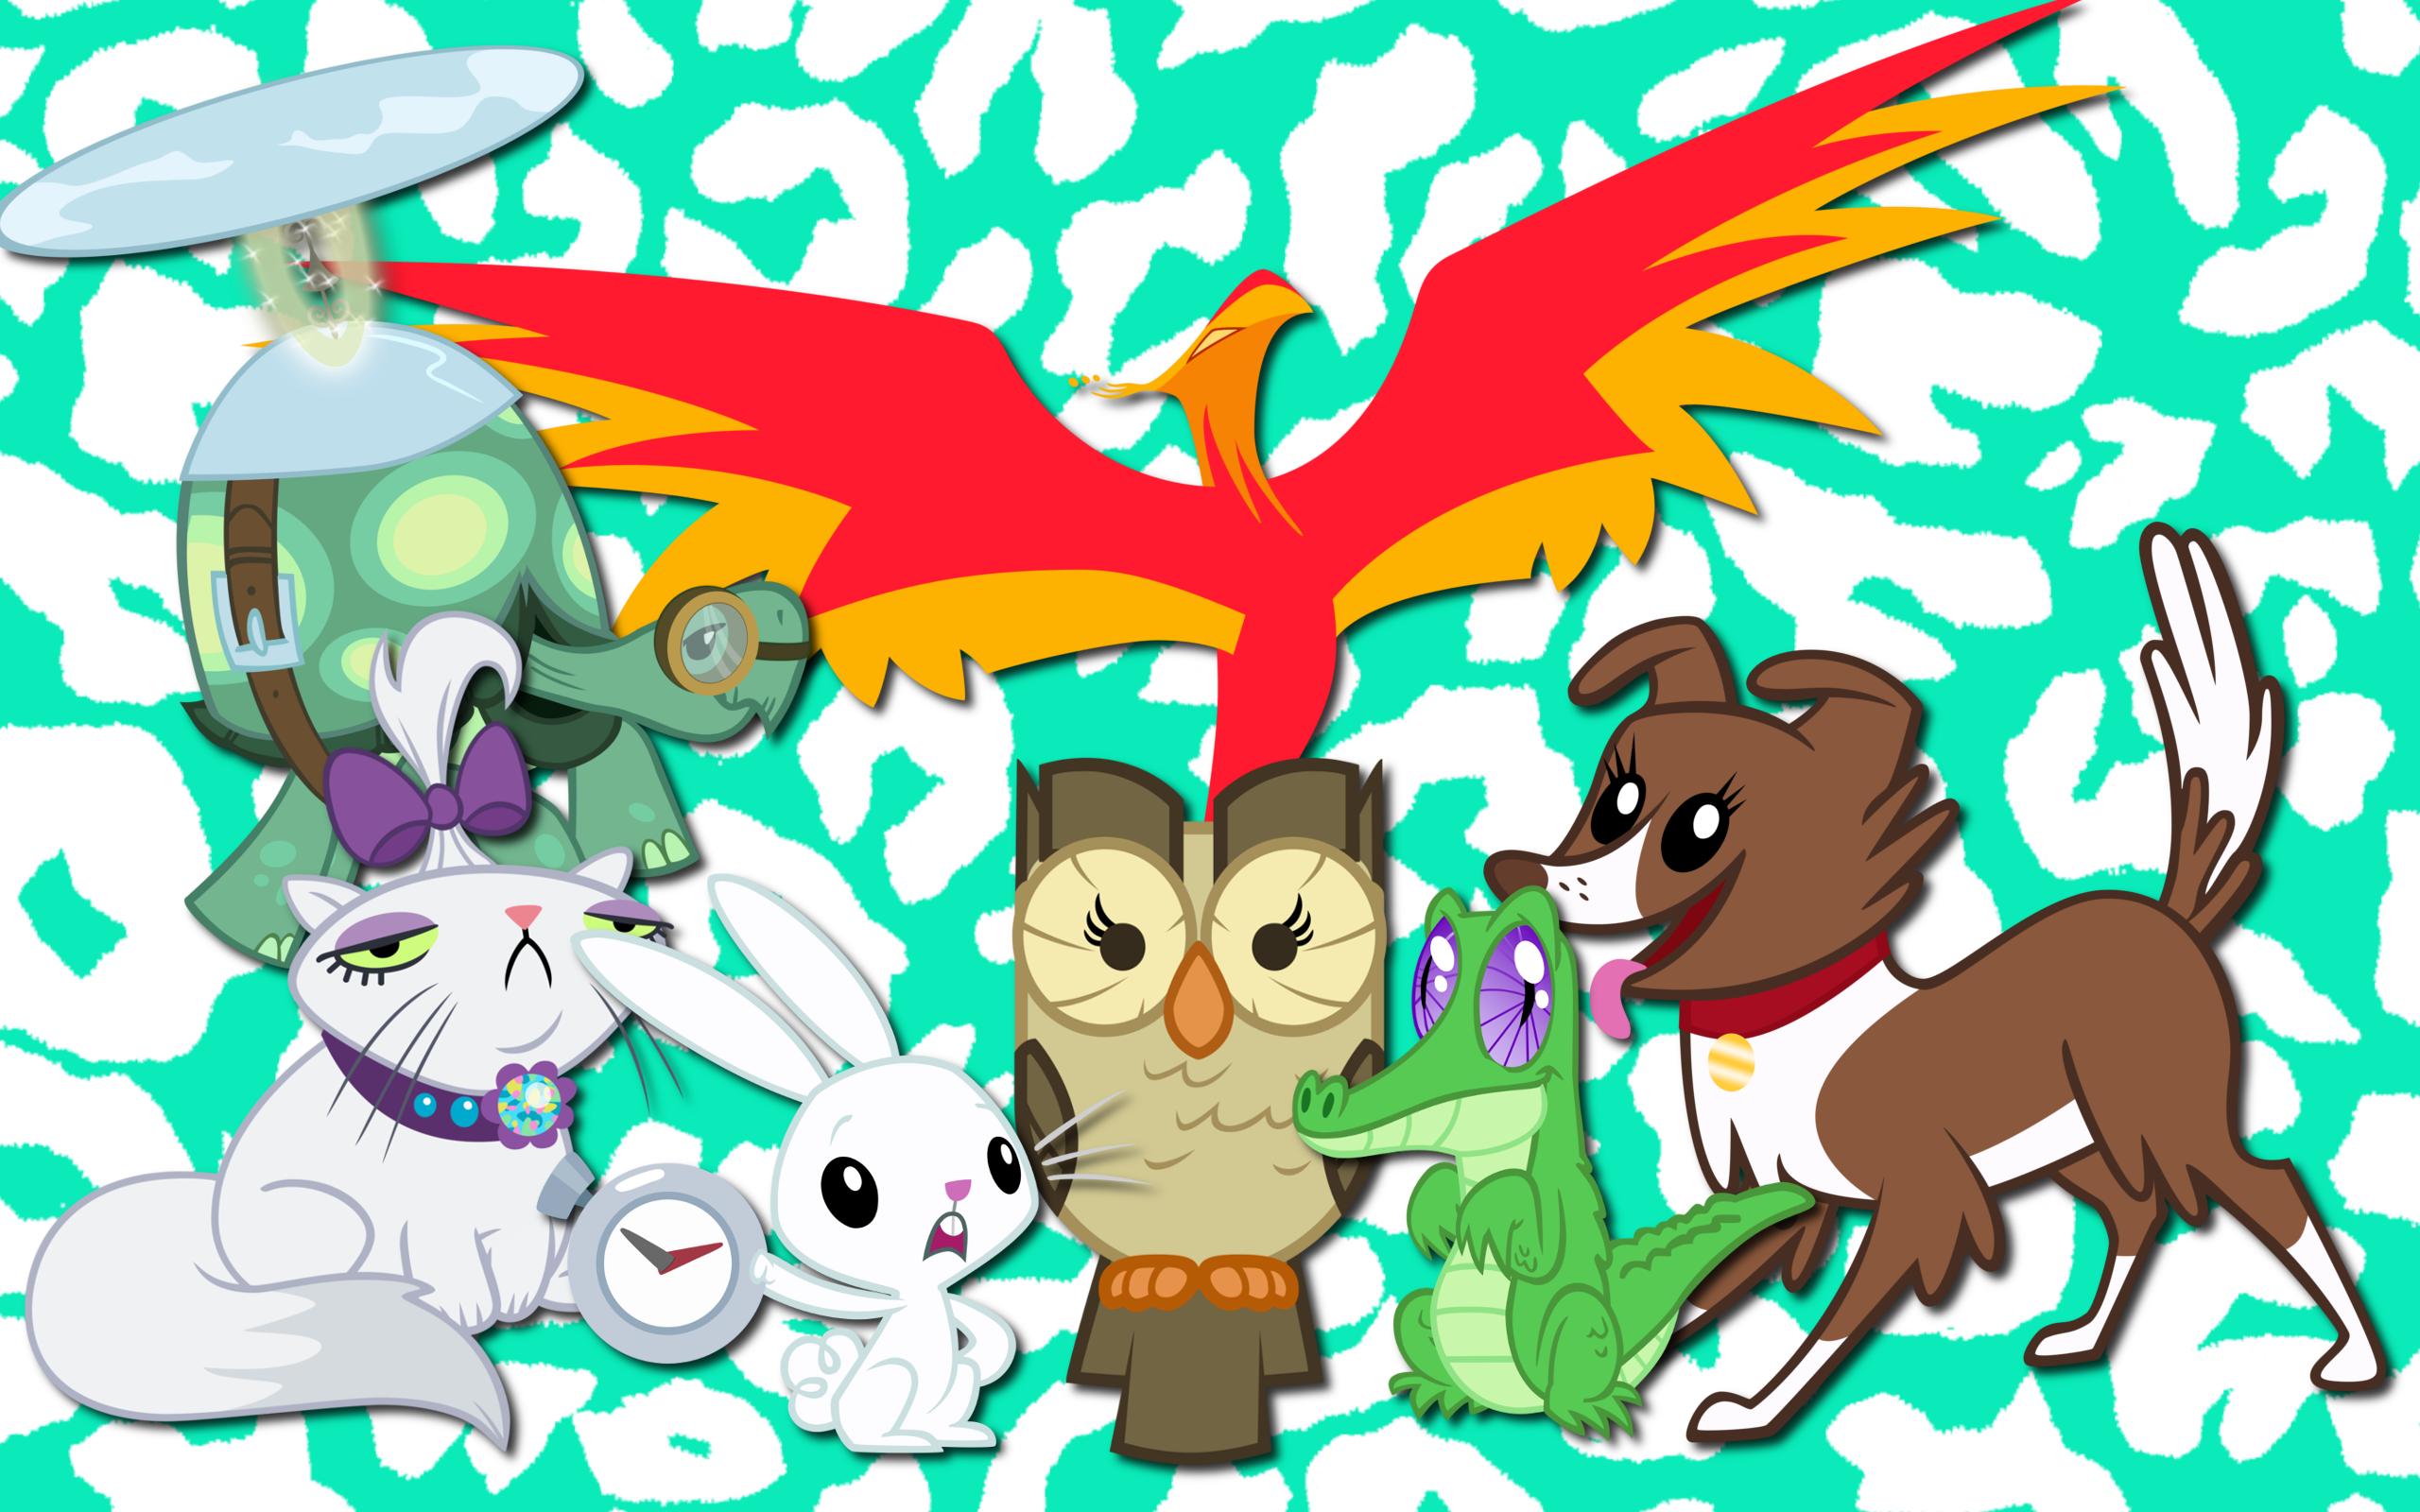 Pets are Magic WP by AliceHumanSacrifice0, AtomicGreymon and Shelmo69